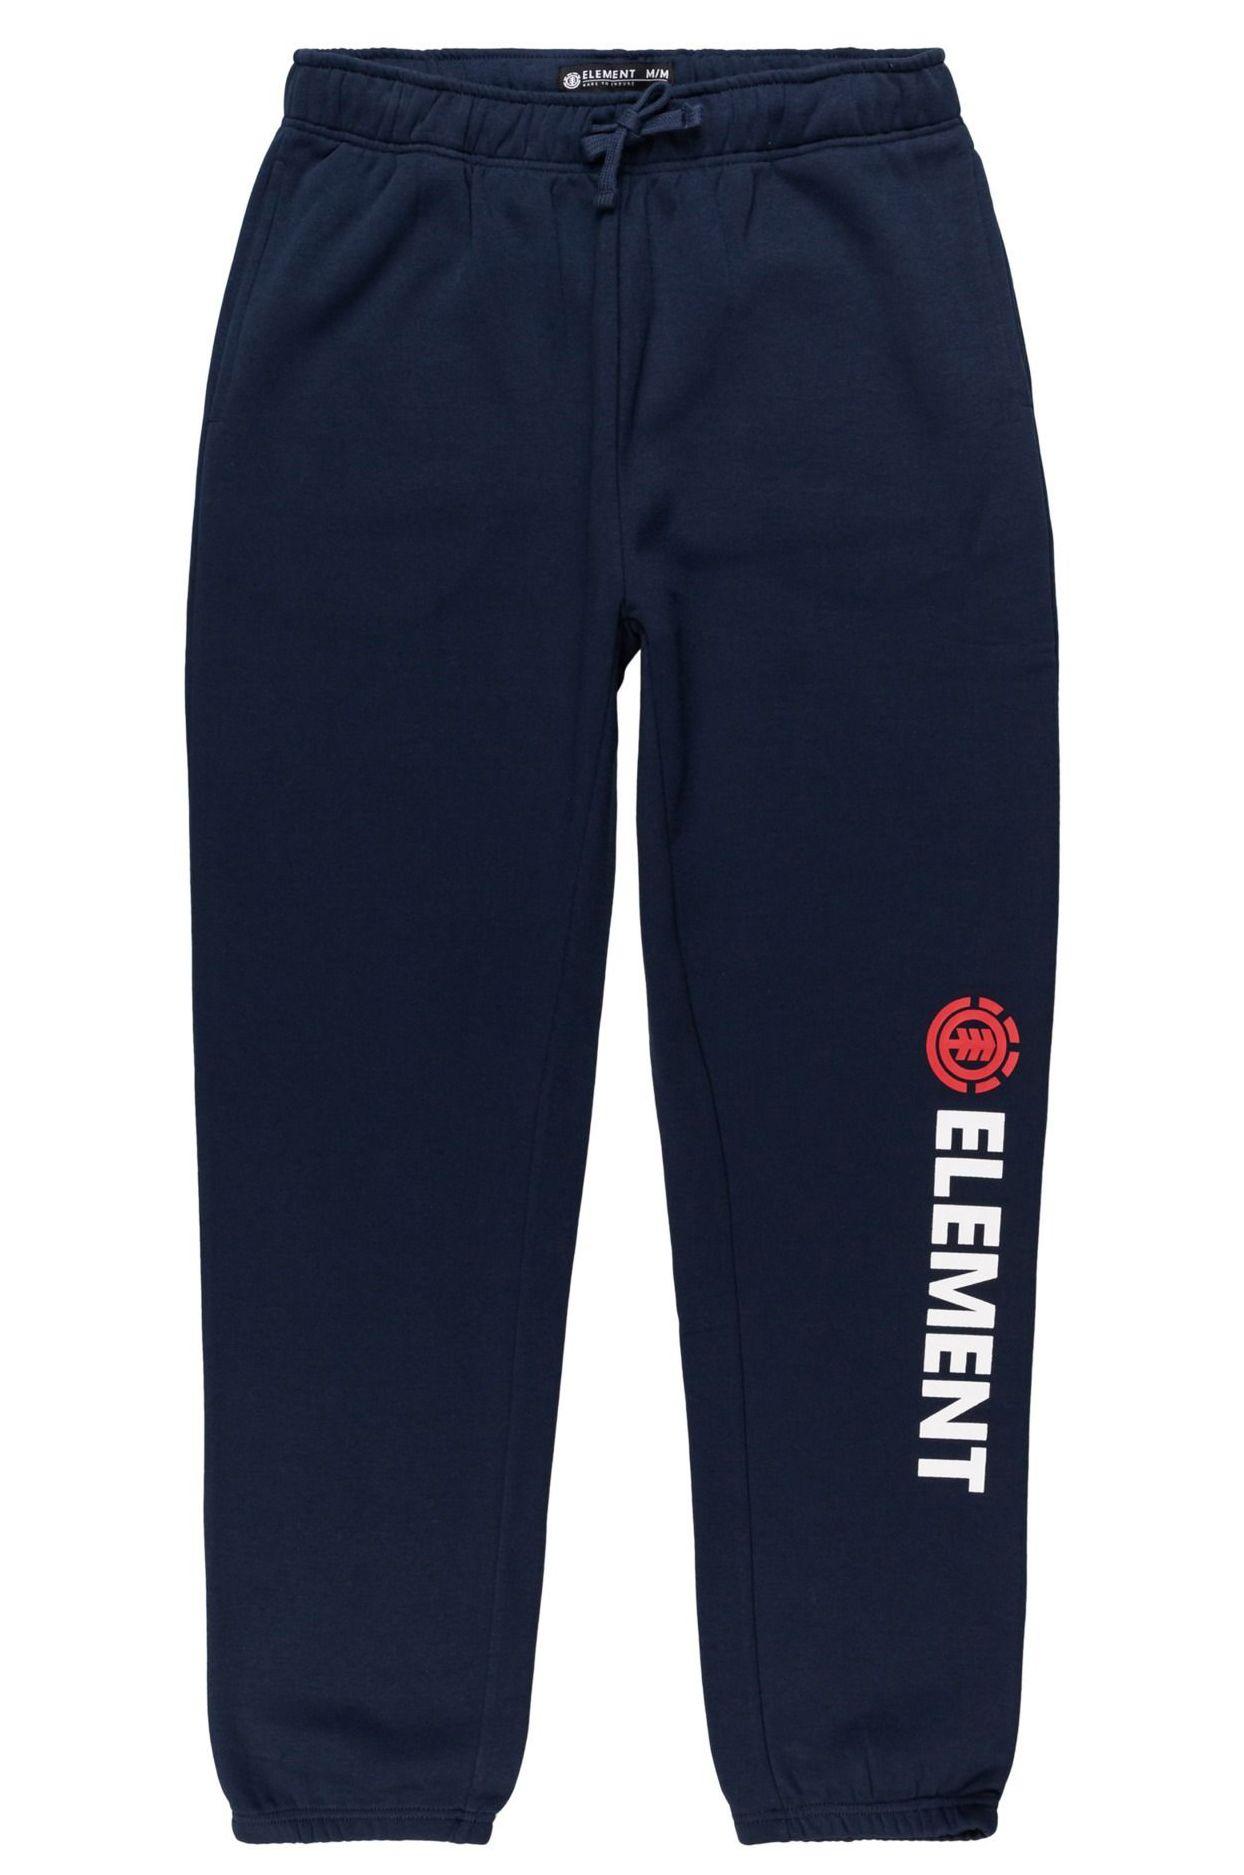 Element Pants CORNELL TRACK PANT Eclipse Navy